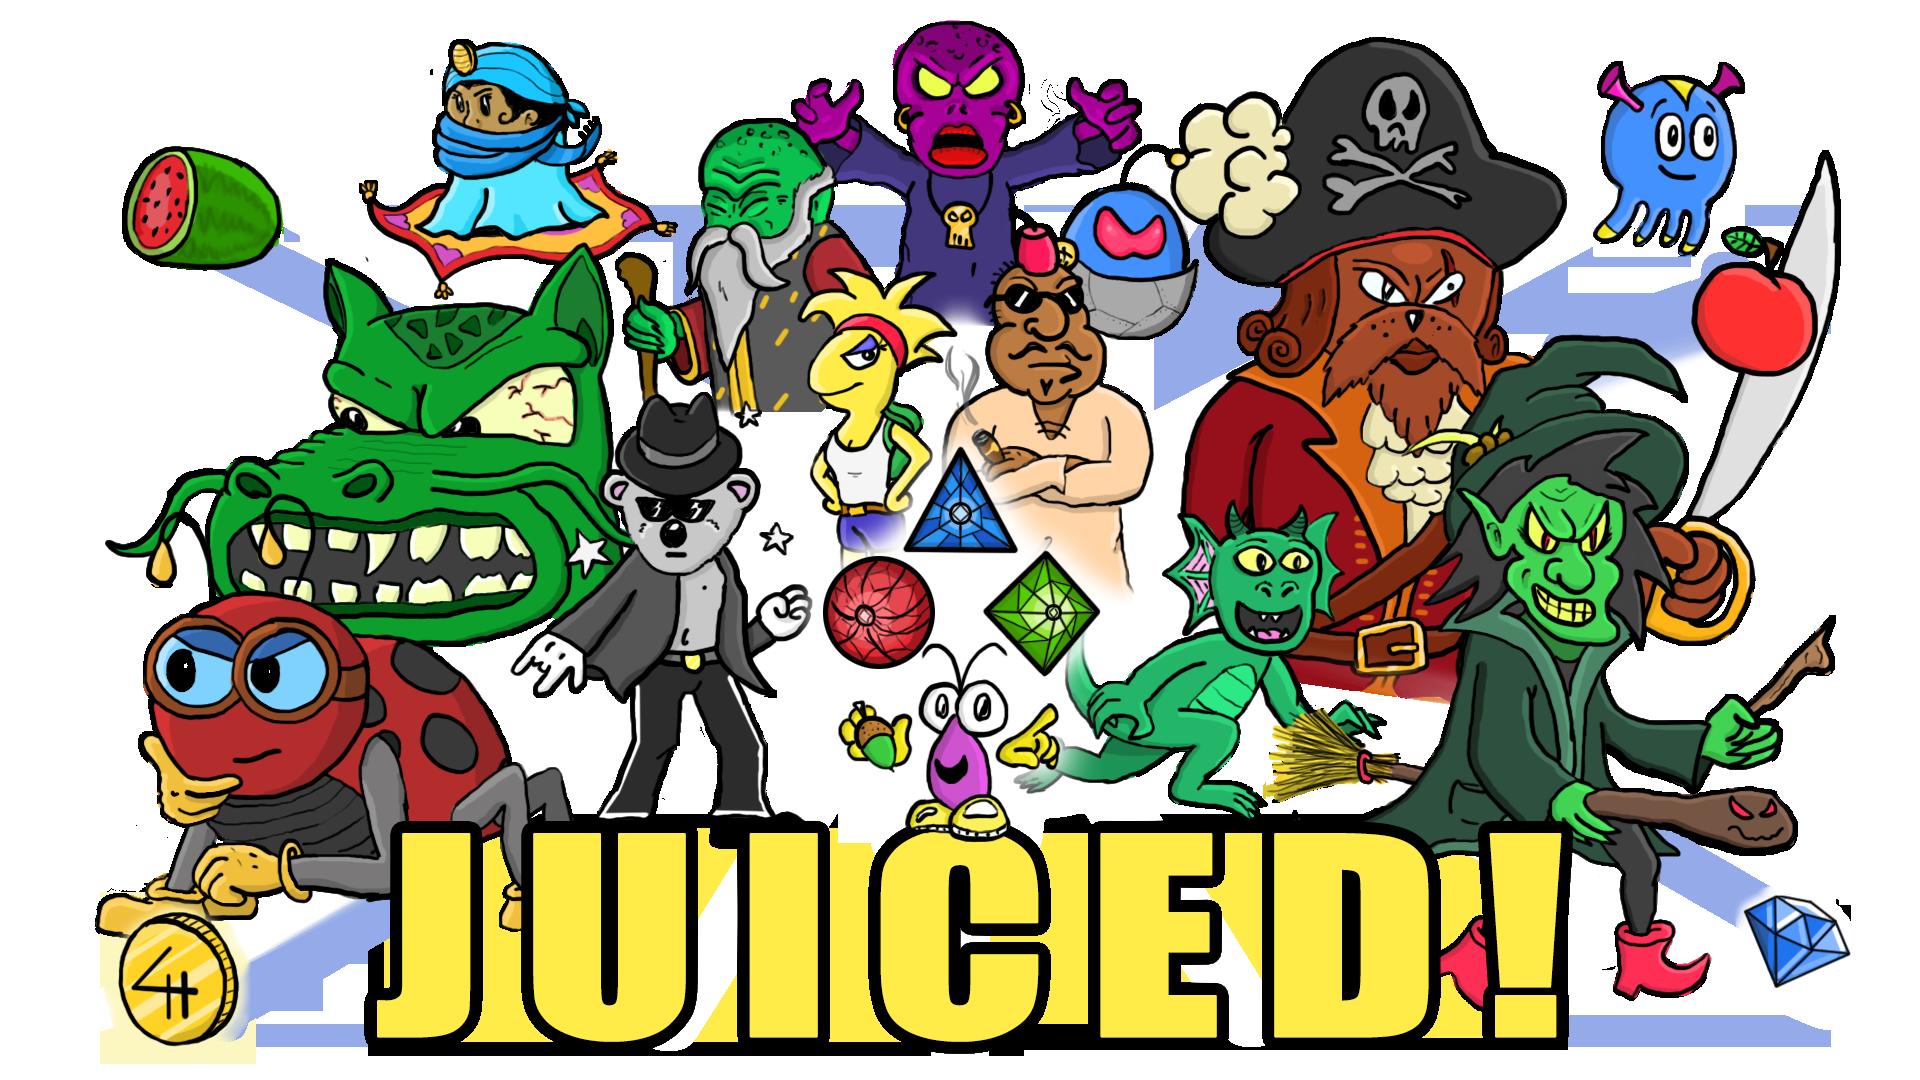 juiced_logo